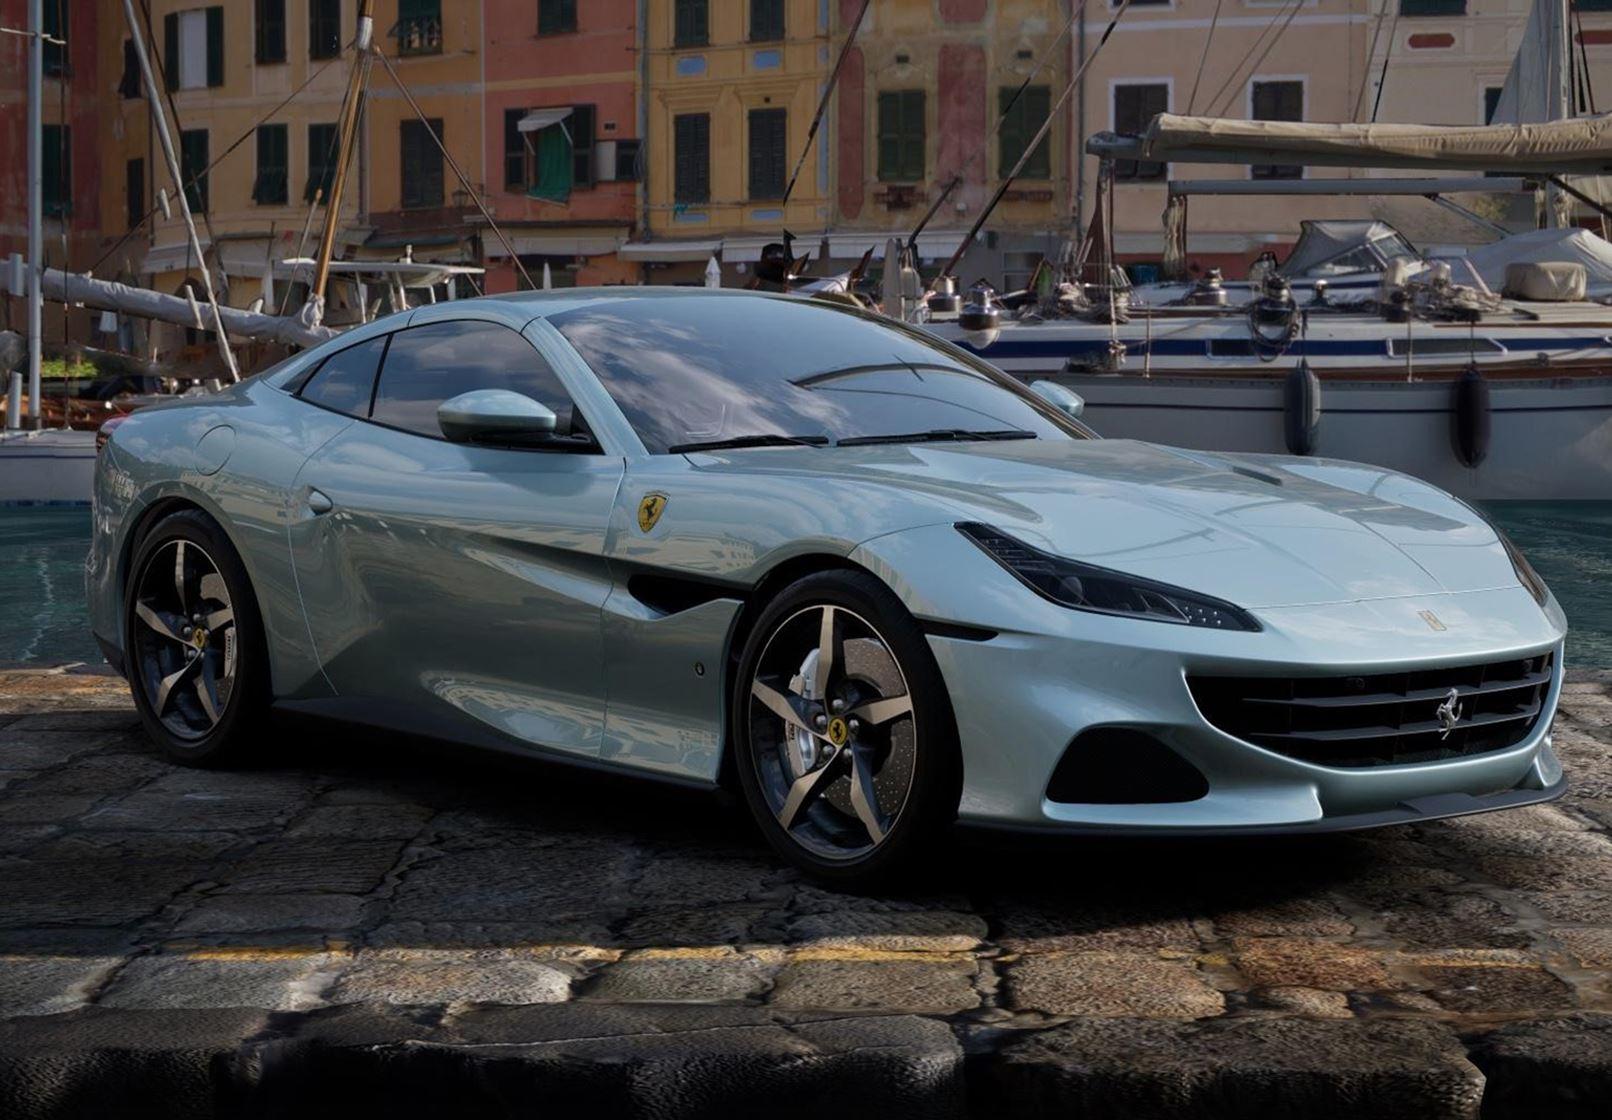 Bbr Ferrari Portofino M Spider Geschlossen Grigio Alloy Limited Edition 1 18 Hansecars Modellautos Hansecars Exklusive Sammlermodelle